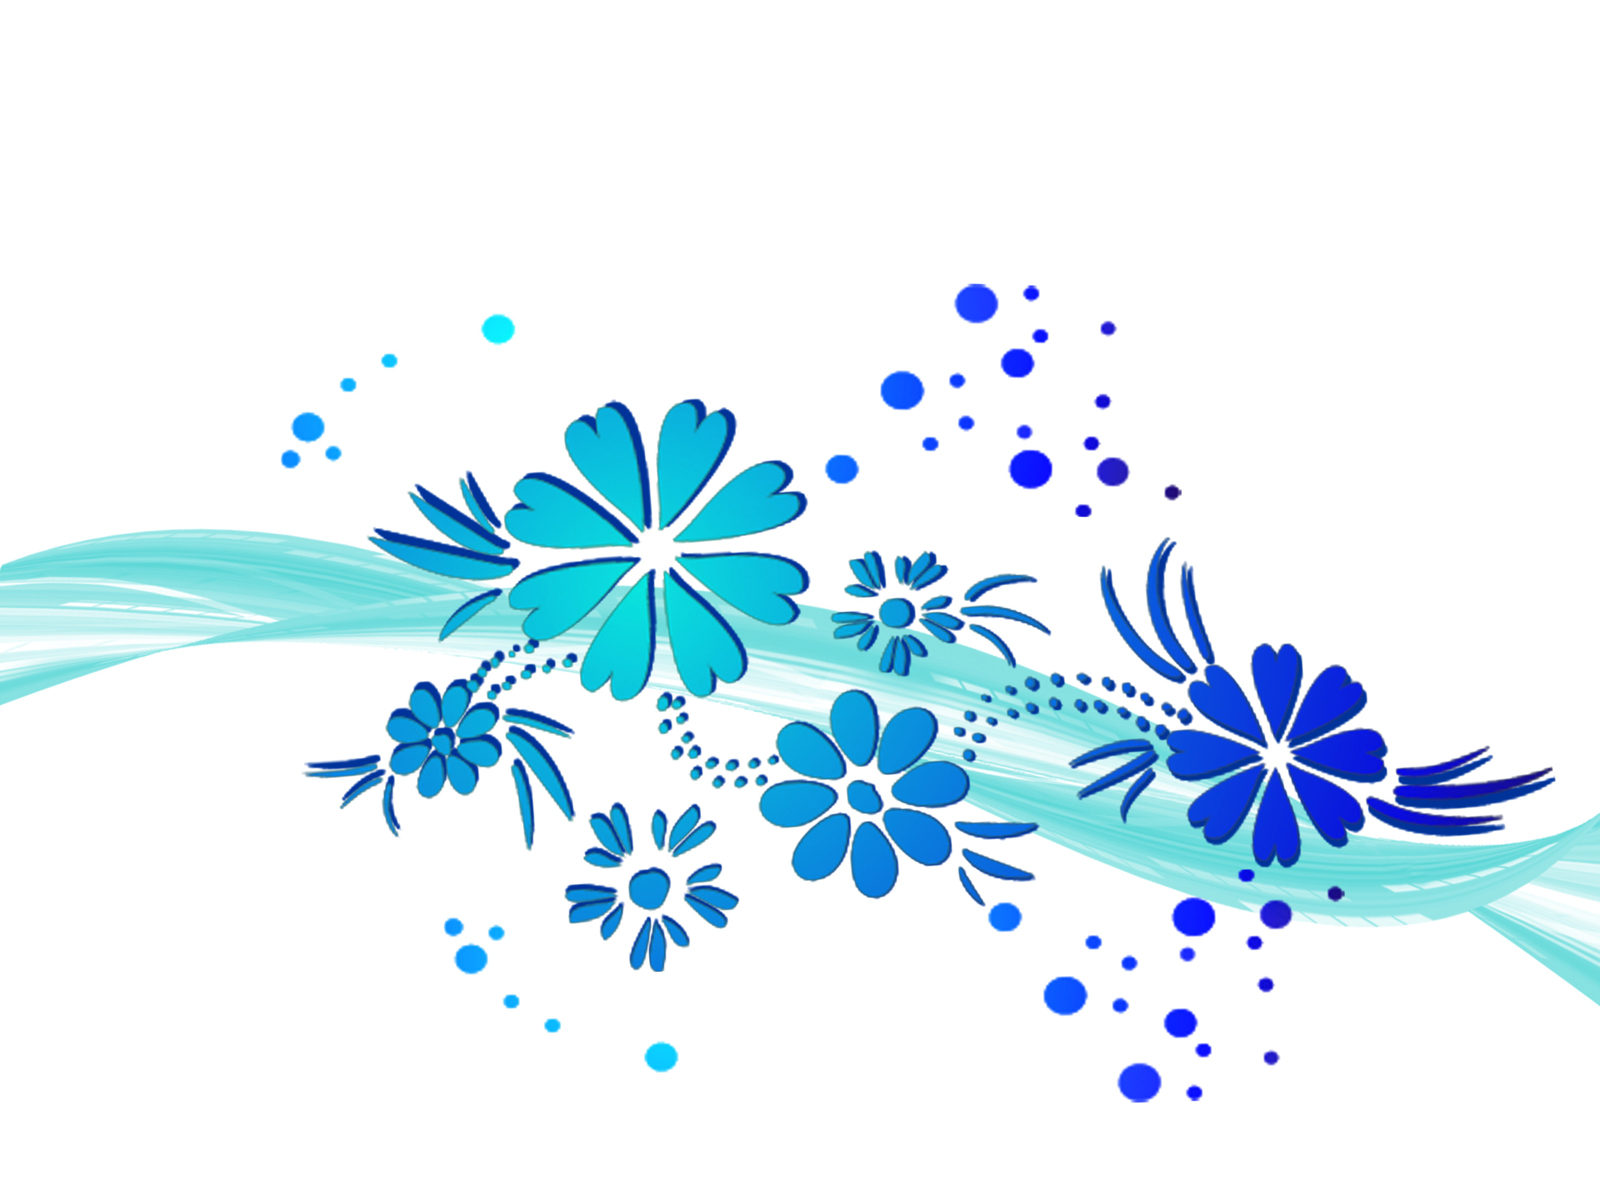 Blue Flower Design Clipart.